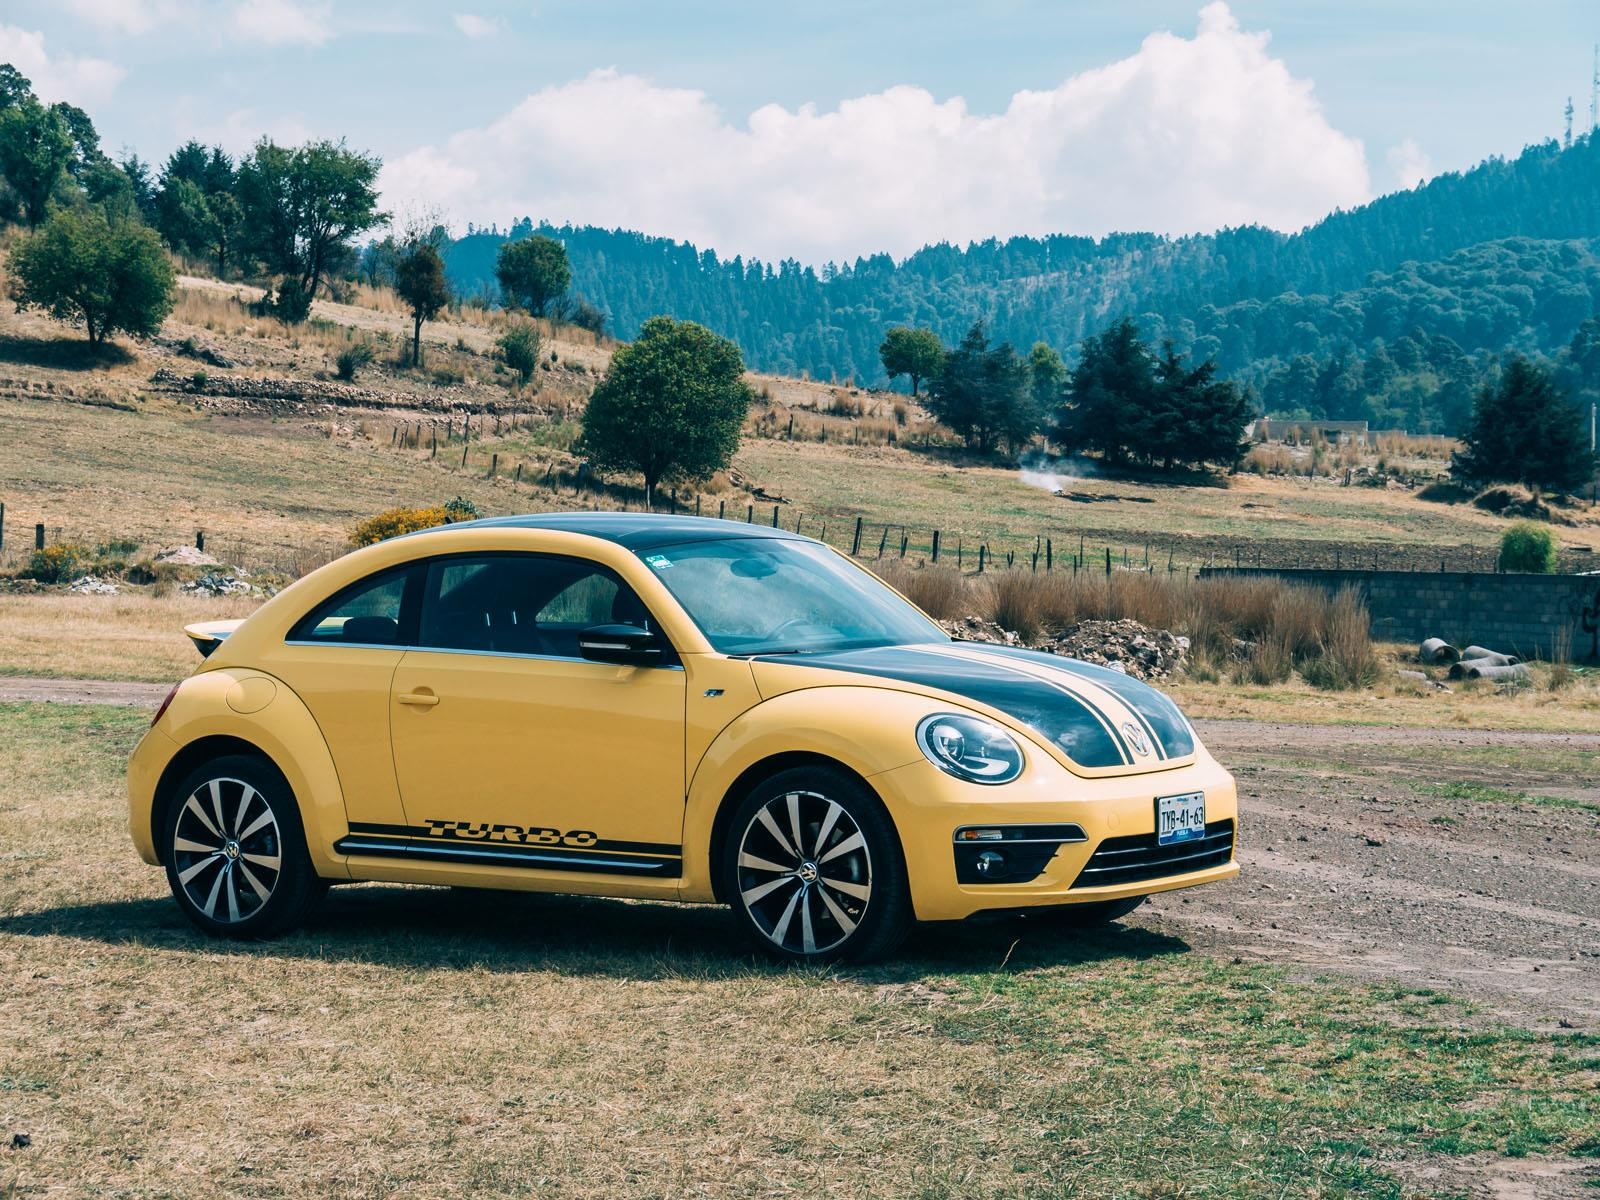 volkswagen beetle turbo r 2014 a prueba. Black Bedroom Furniture Sets. Home Design Ideas